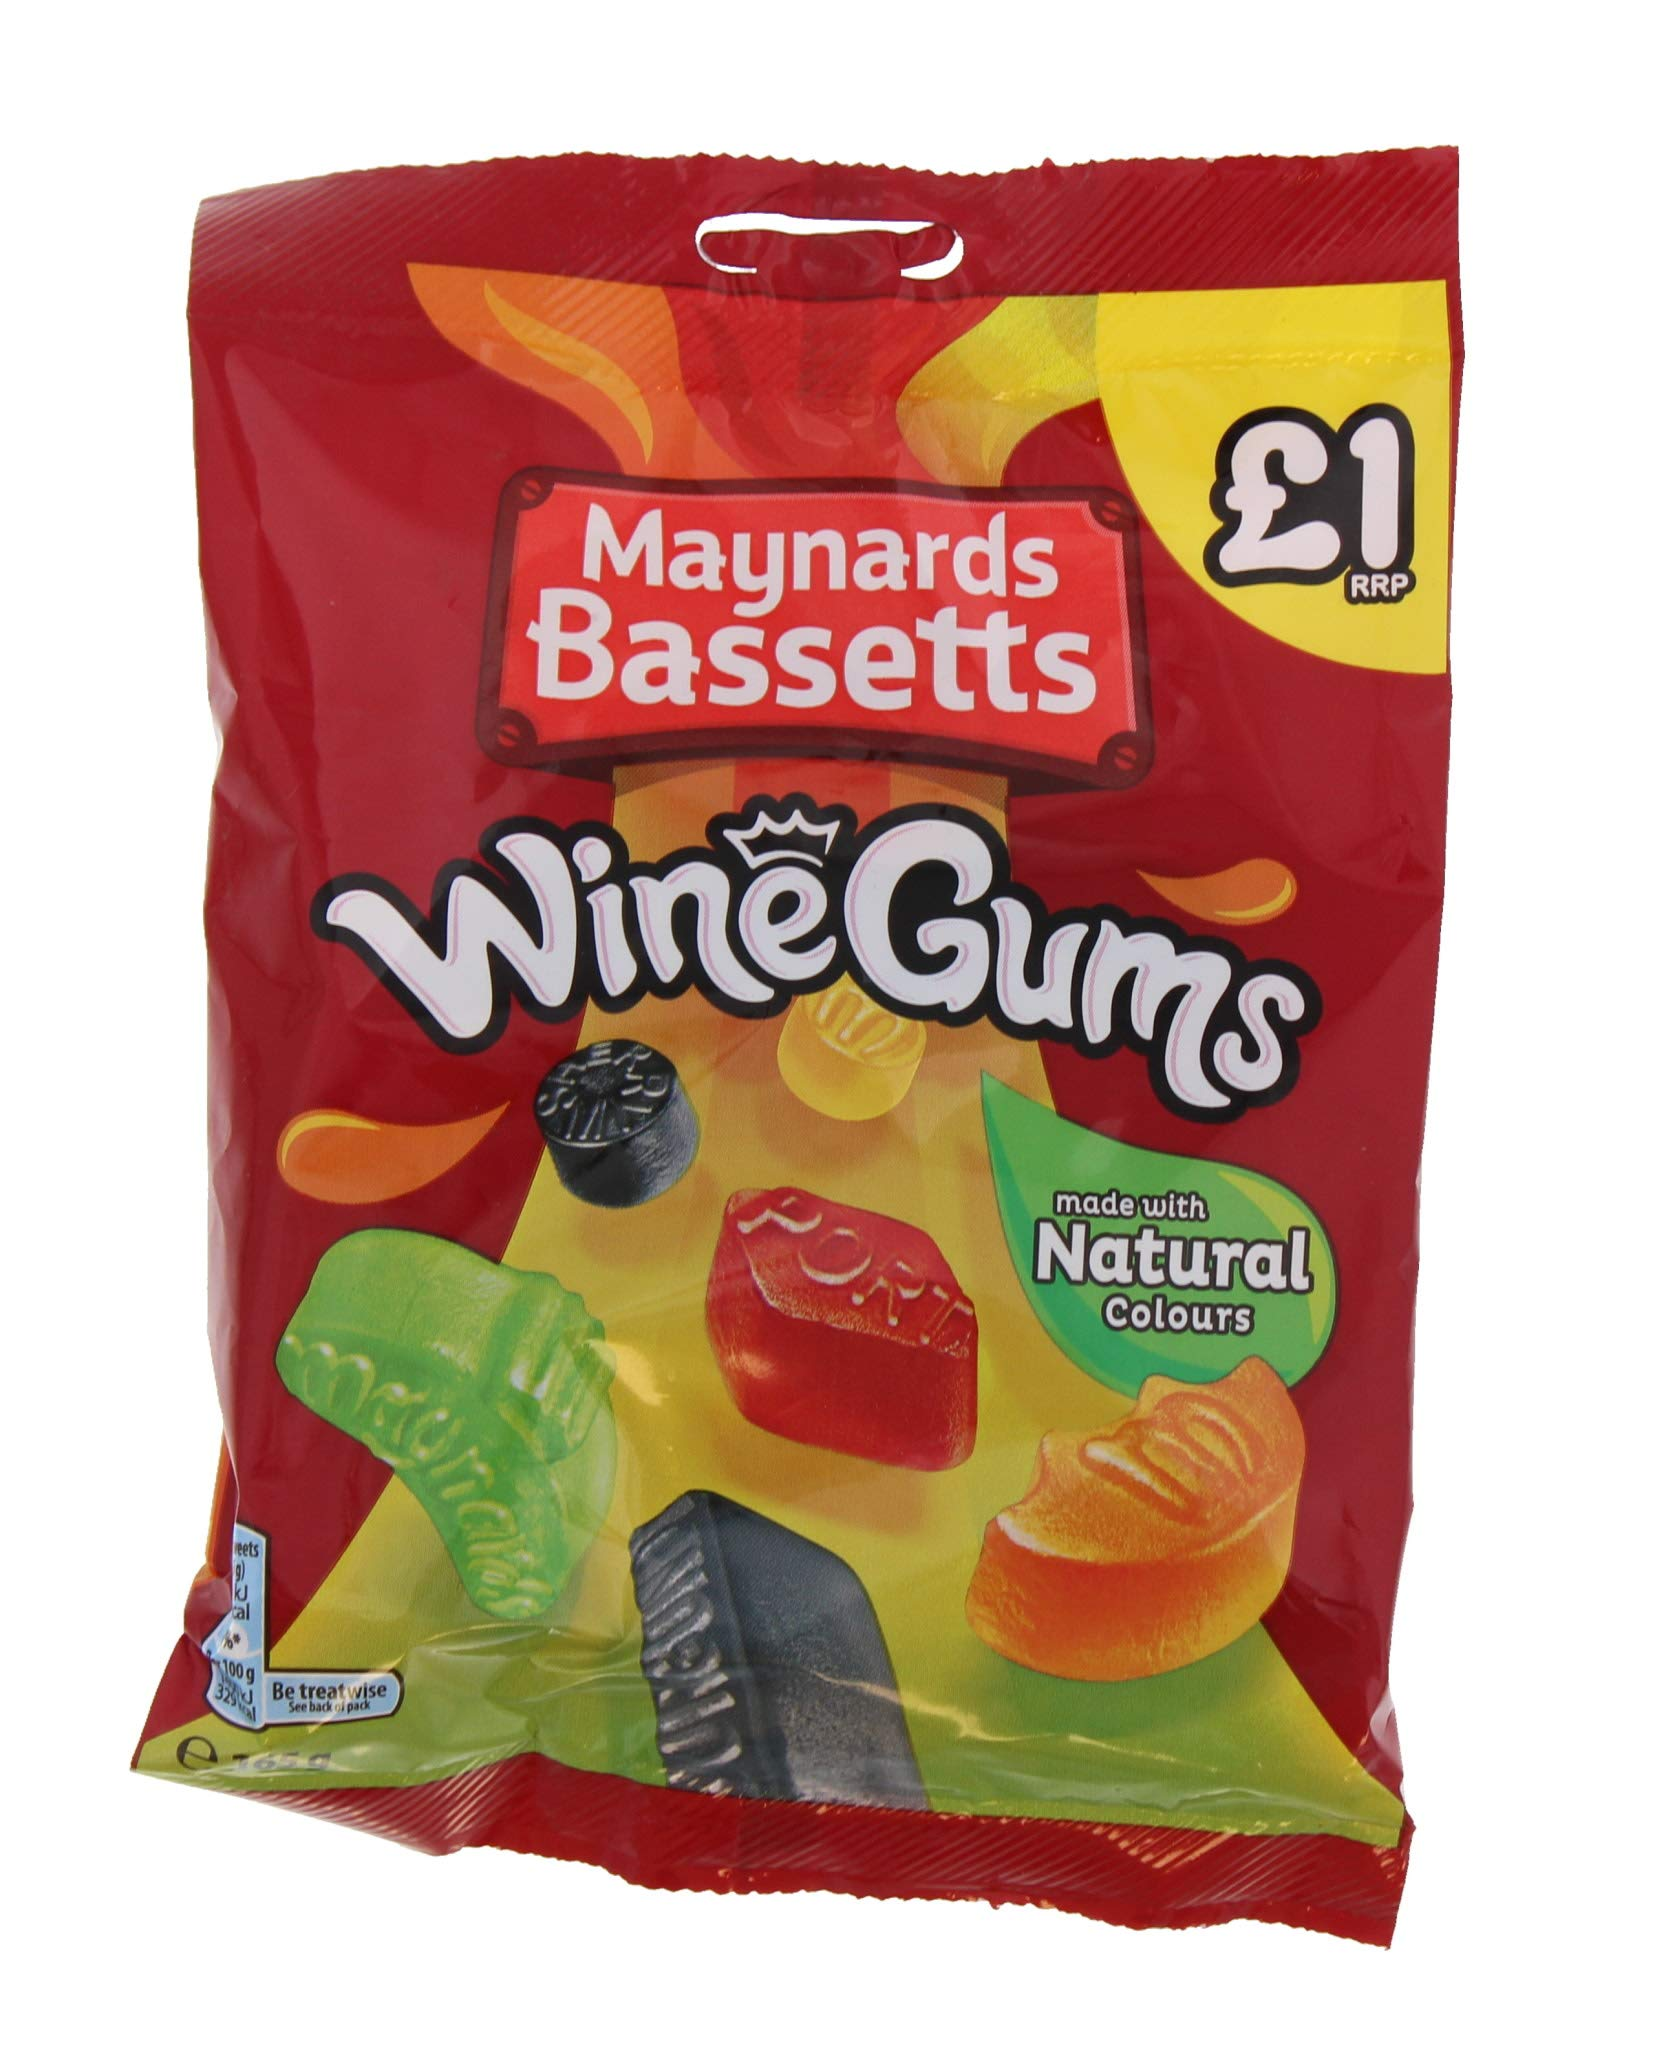 Maynards Bassetts Wine Gums £1 Sweets Bag (165g x 12)